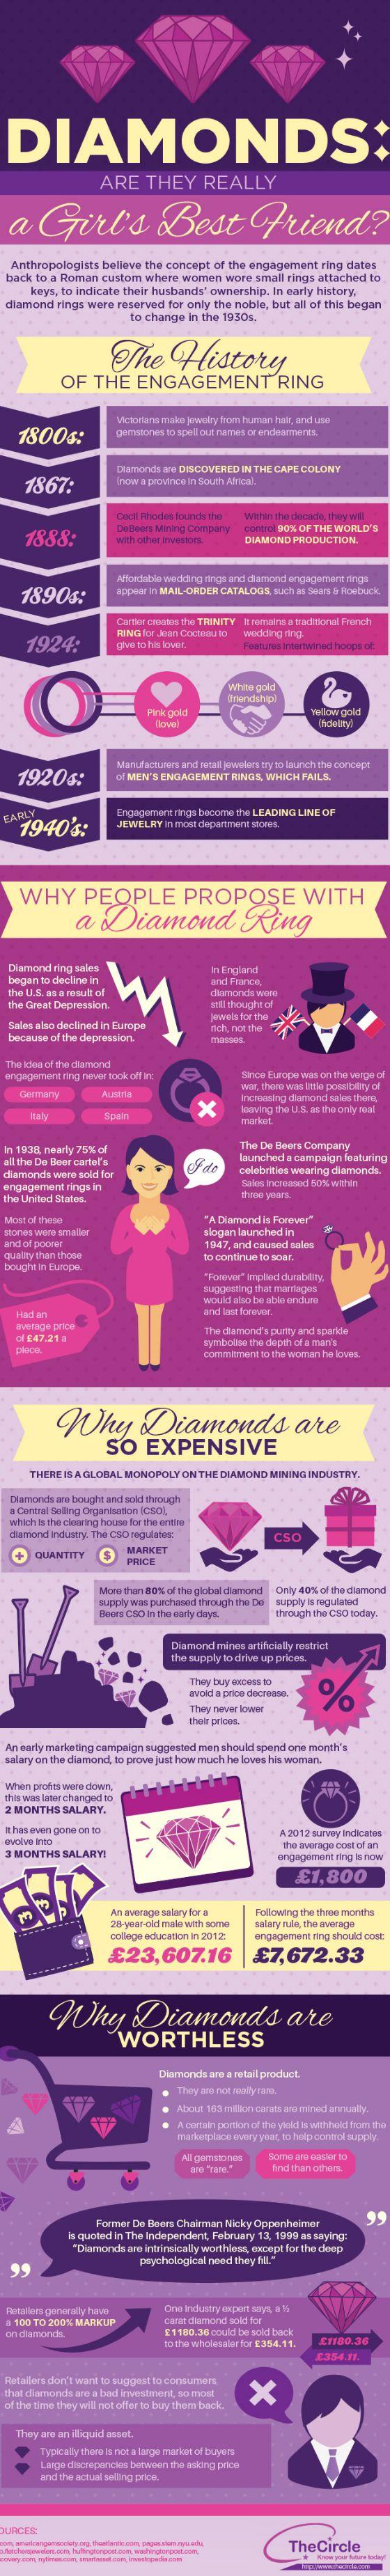 221 best Jewelry Infographics images on Pinterest | Gems, Gemstones ...